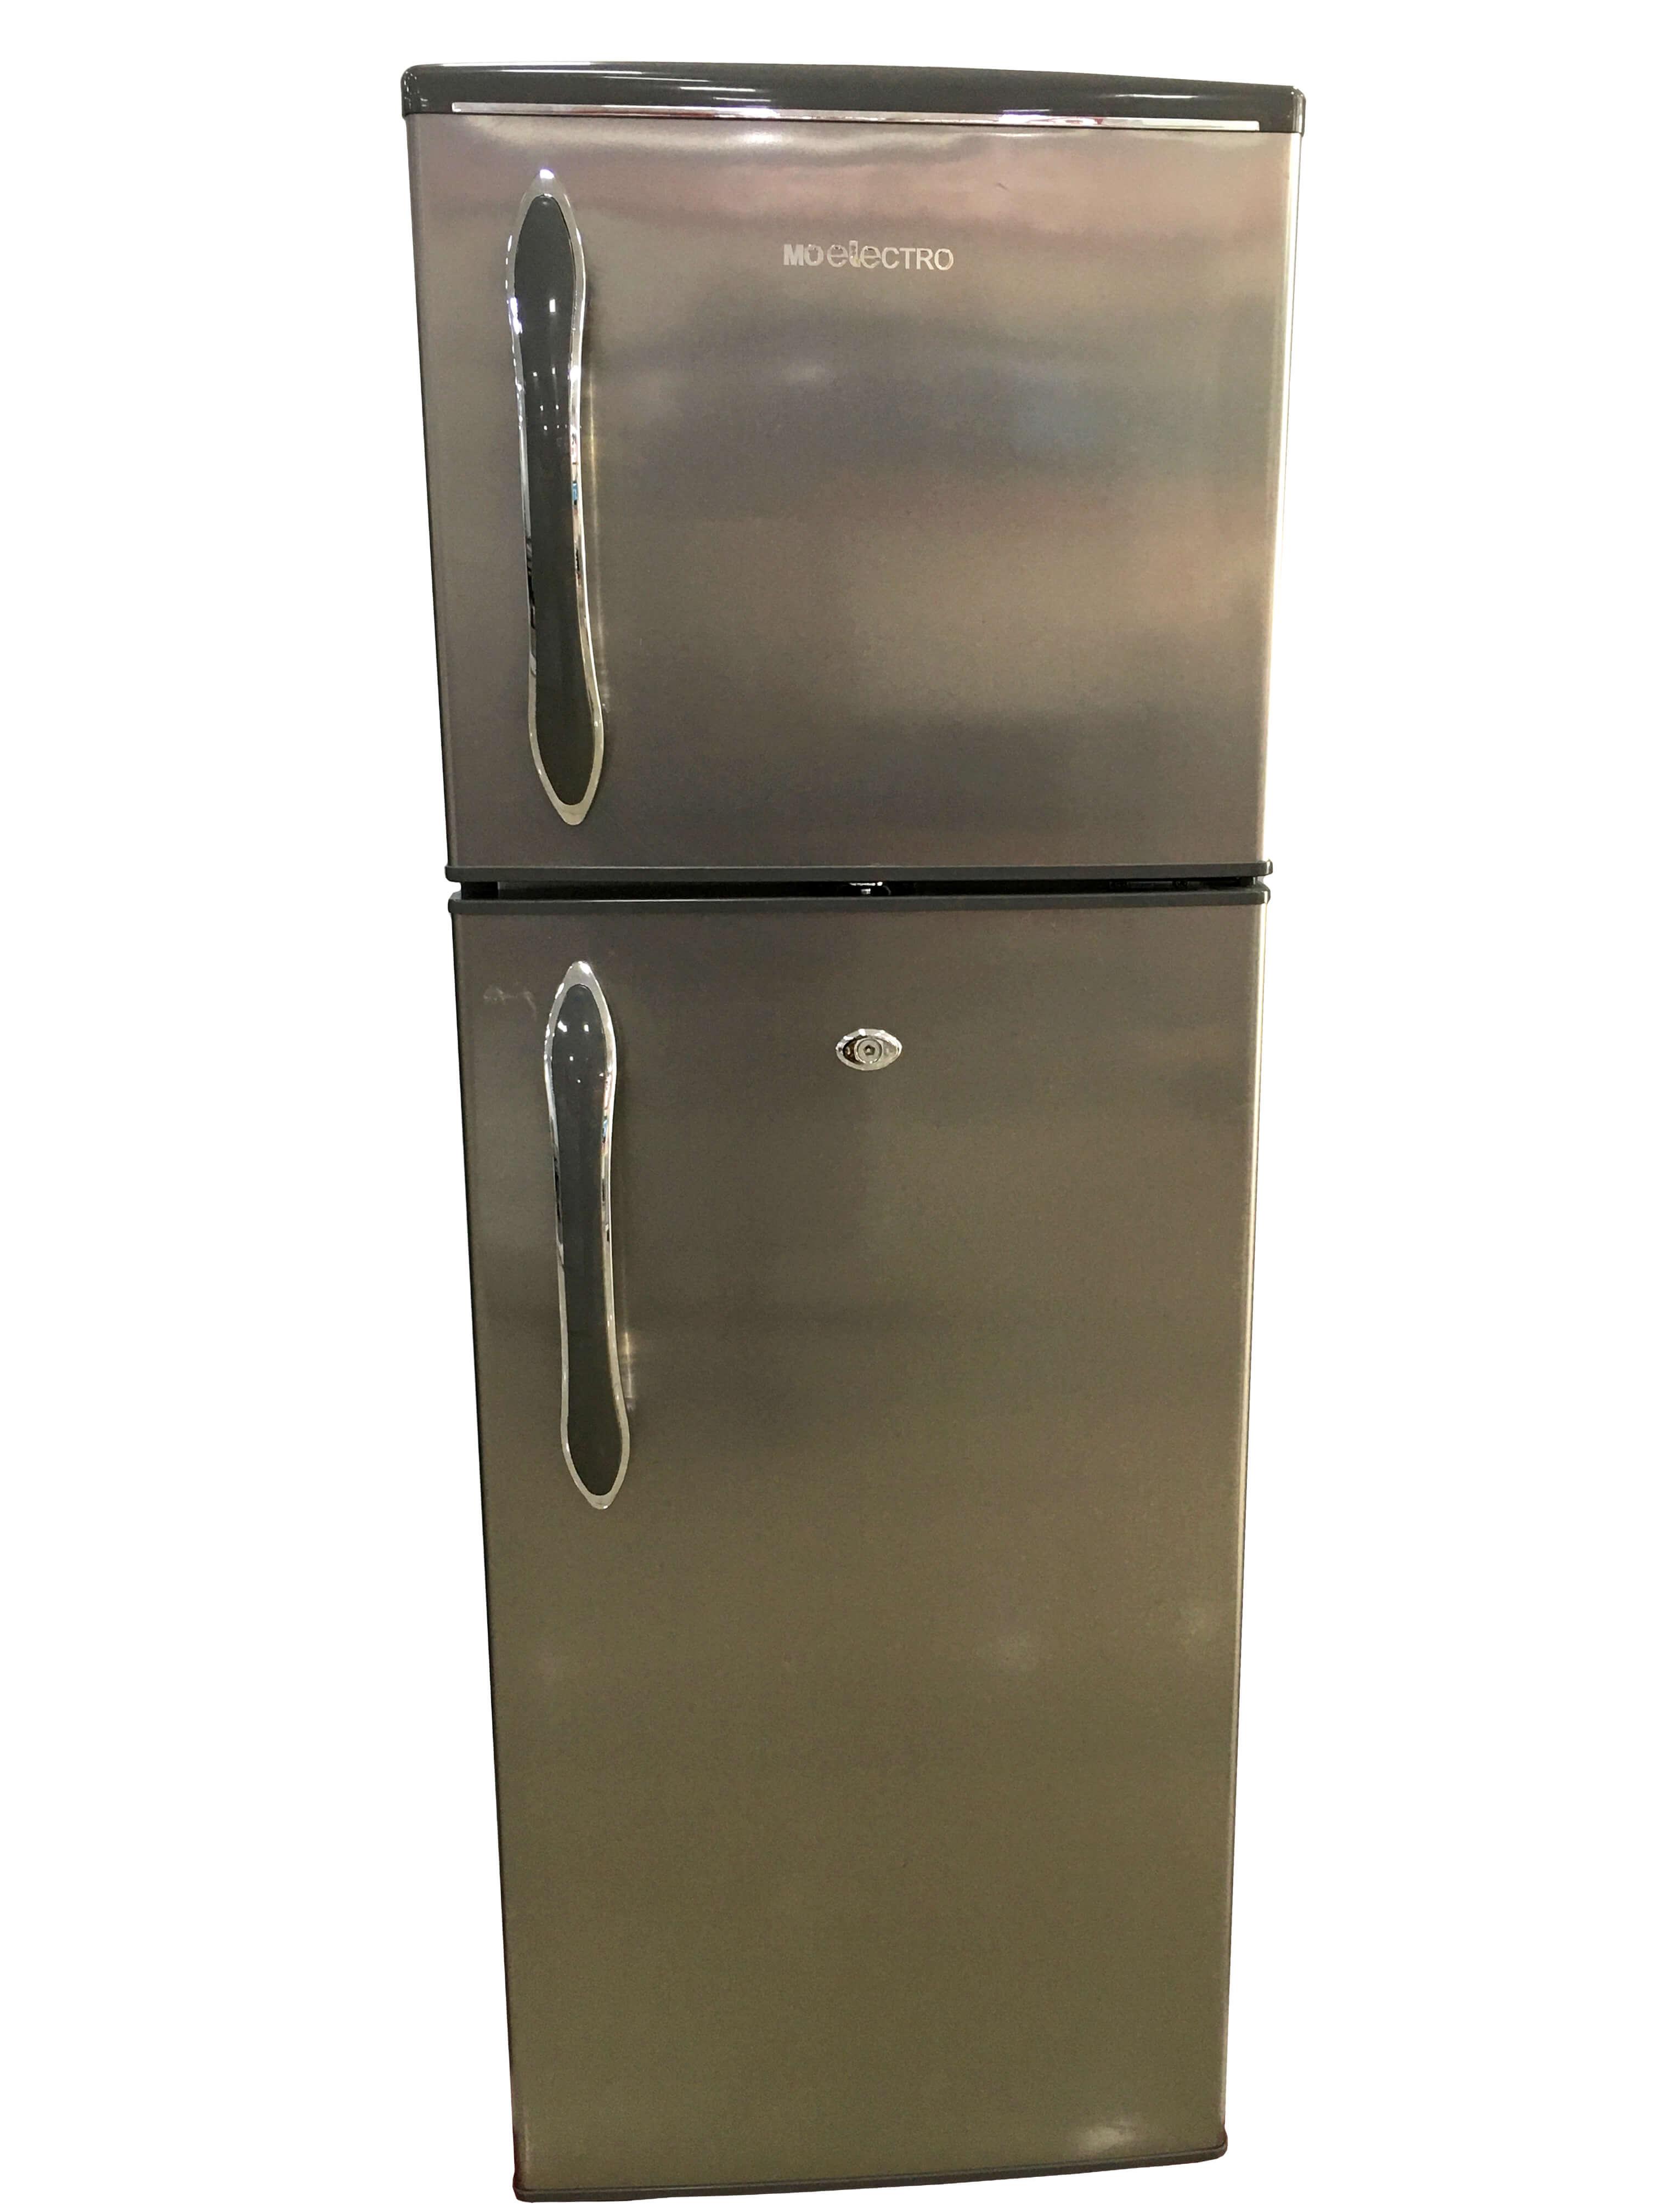 MO Electro Double Door Fridge 275L, MOF-D275HS, Silver